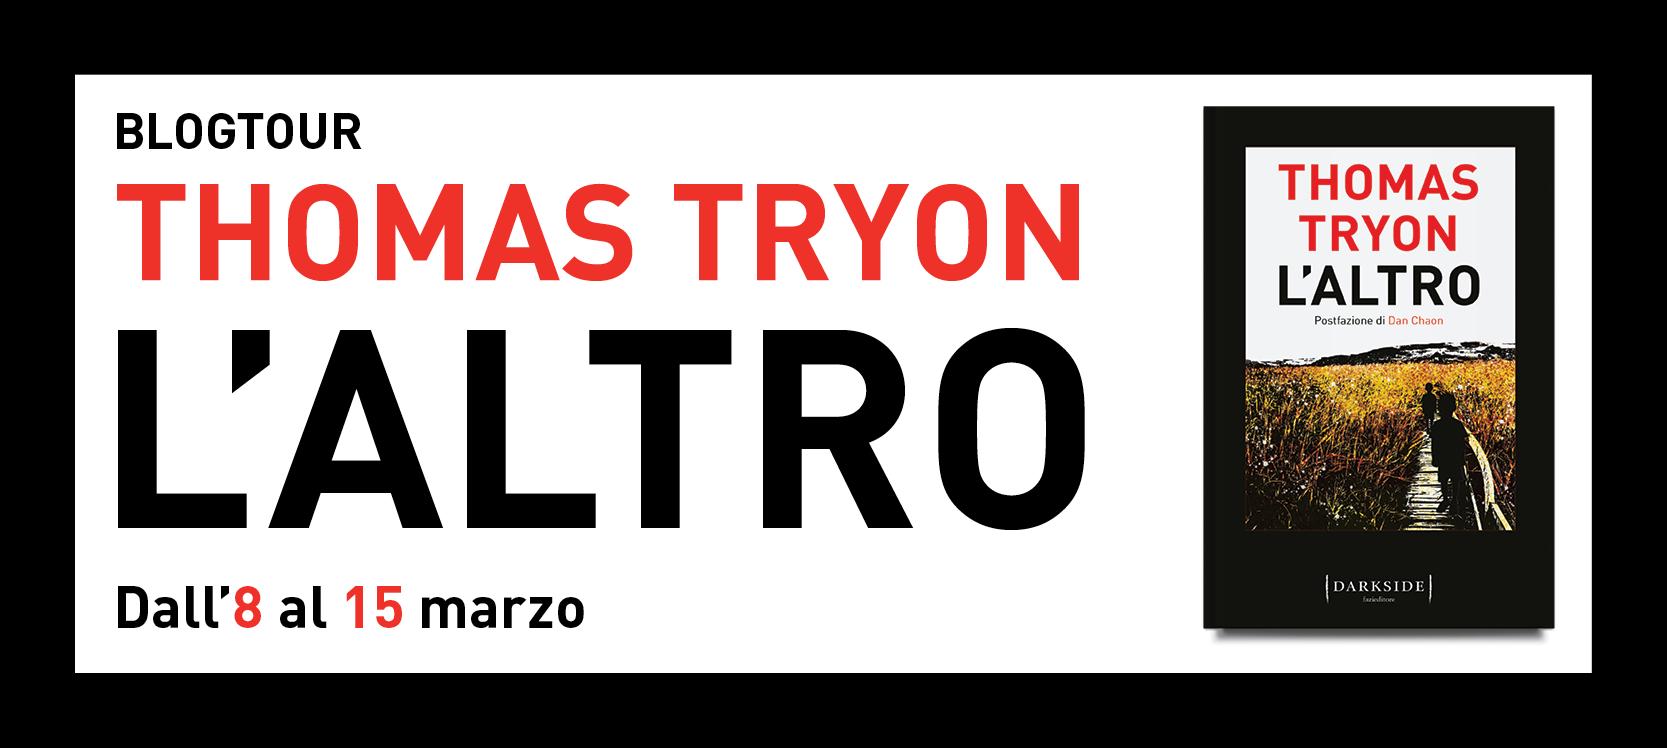 "I 5 motivi per leggere ""L'altro"" di Thomas Tryon"